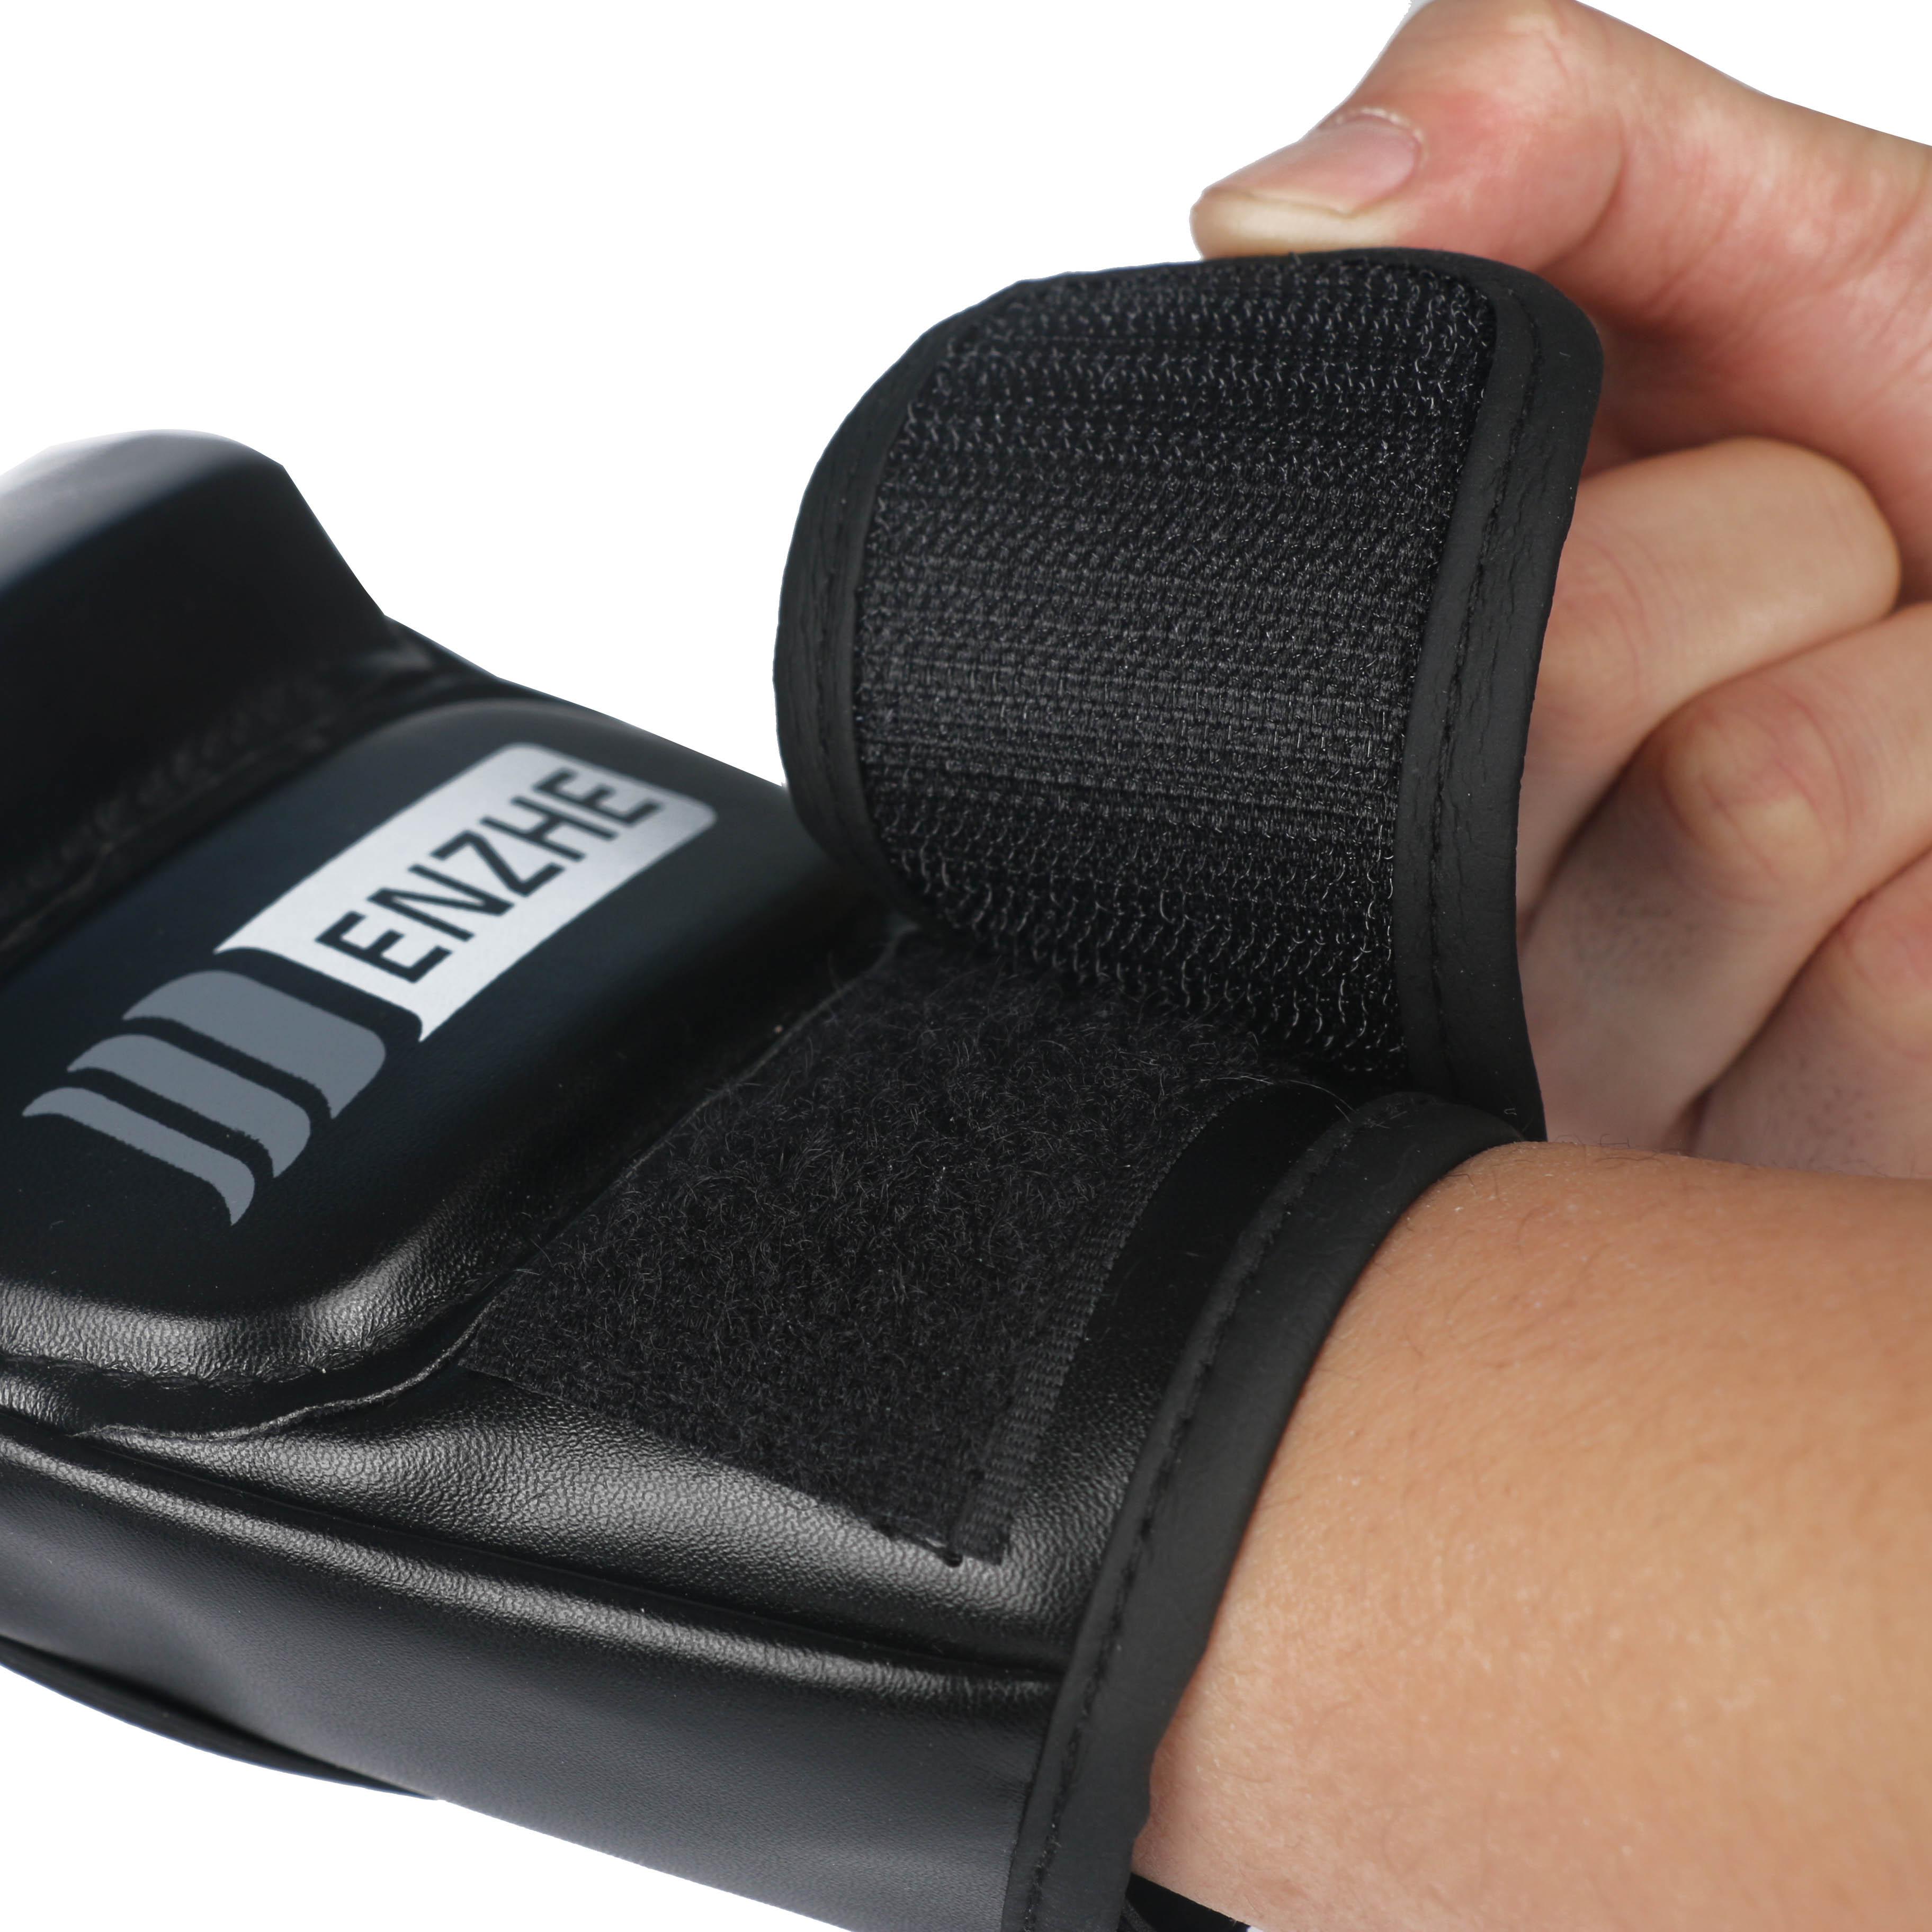 Muay Thai Kick Boxing para Treinamento de Luta (1 Par)